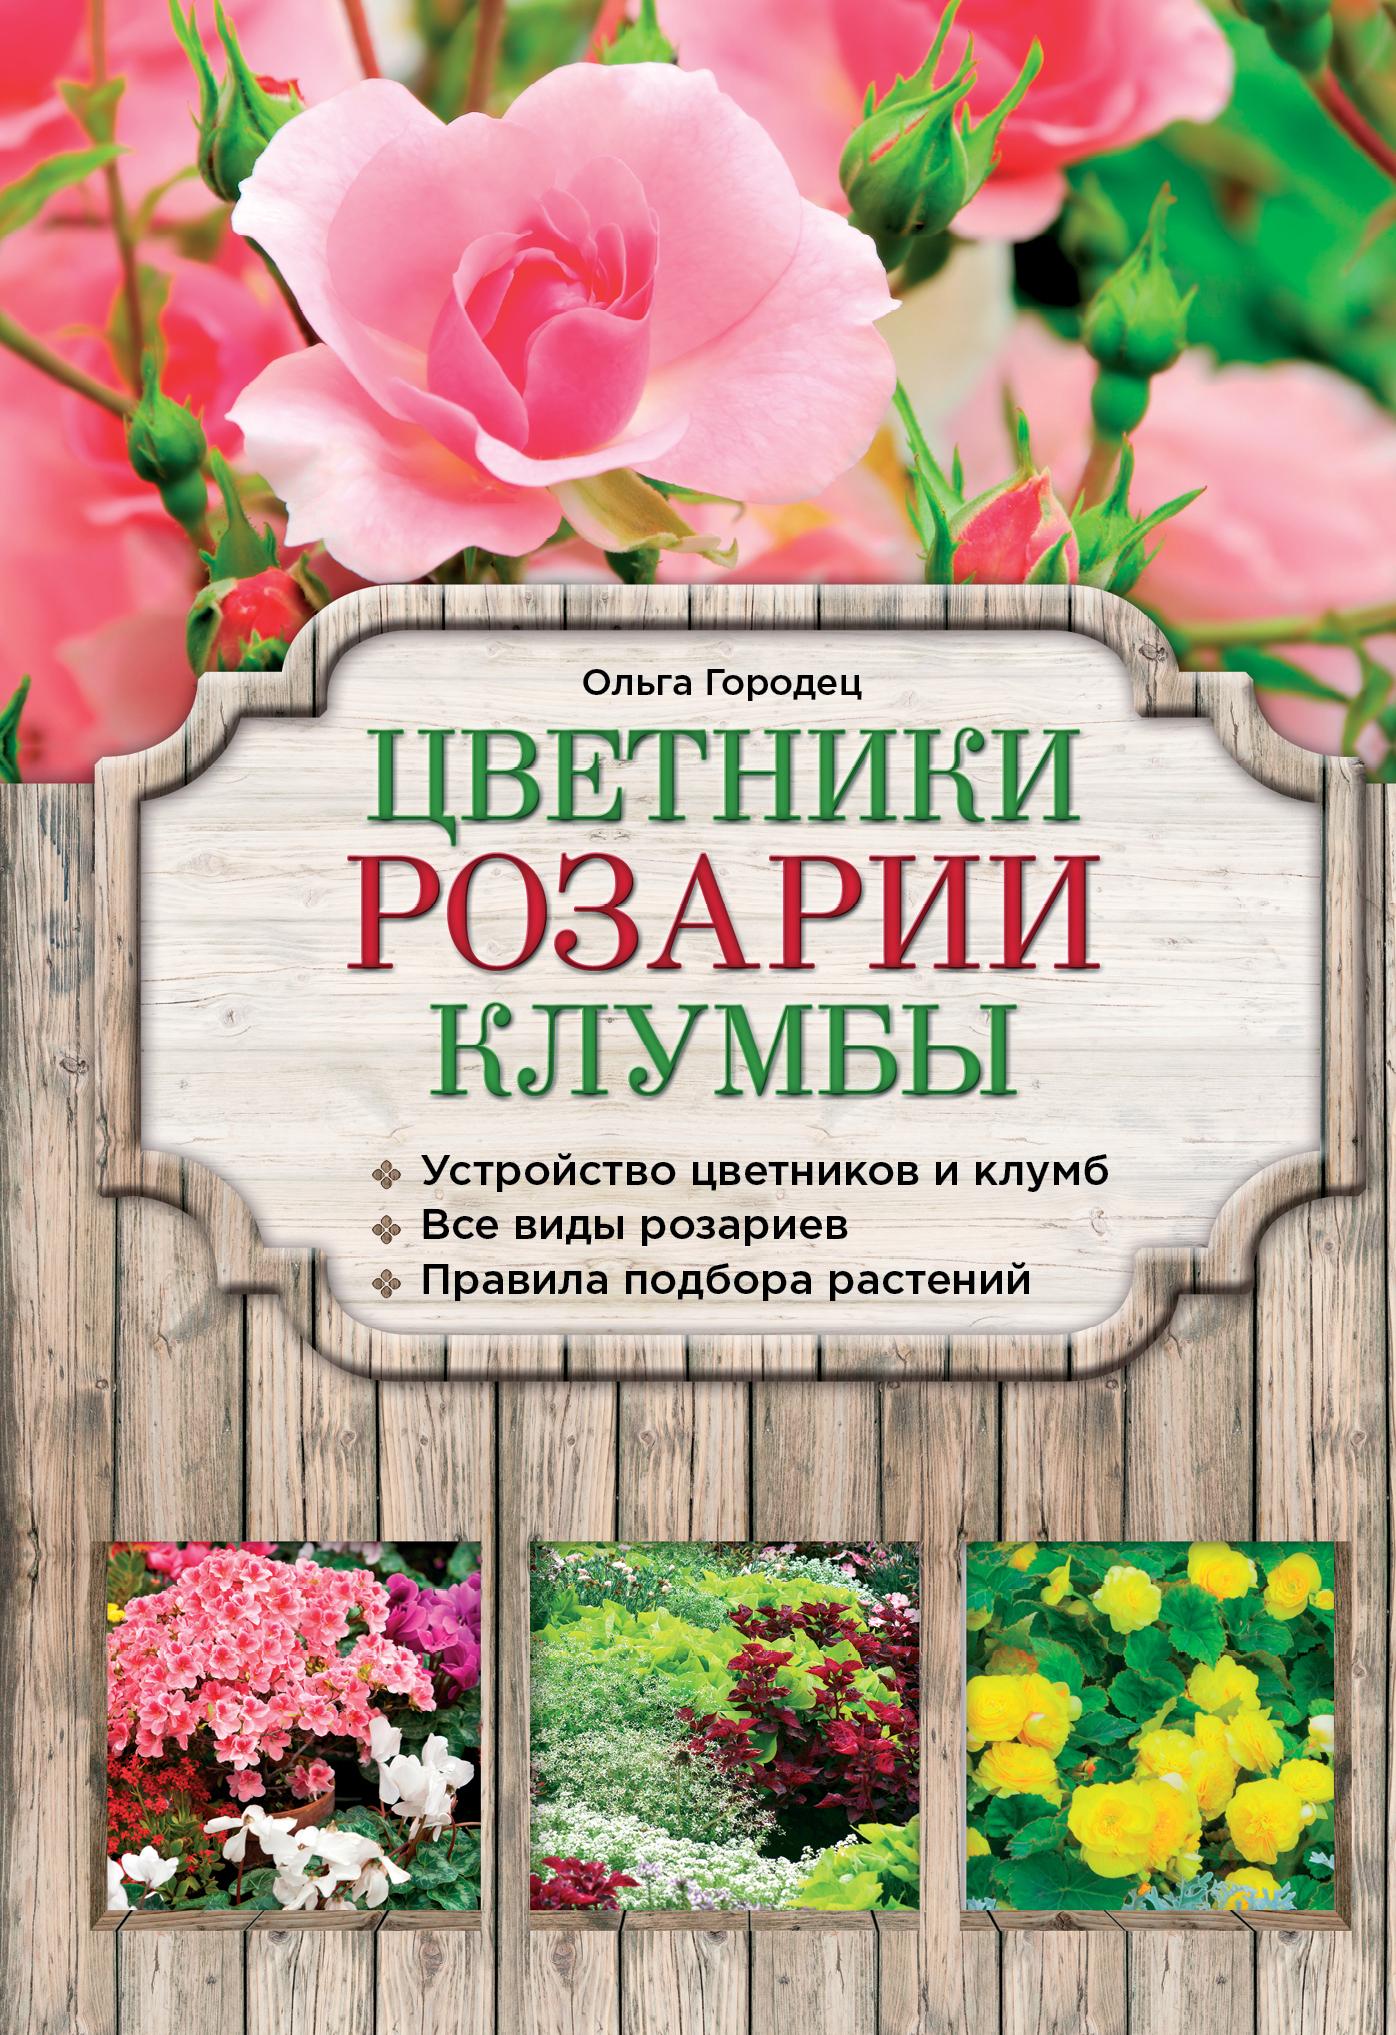 Цветники, розарии, клумбы